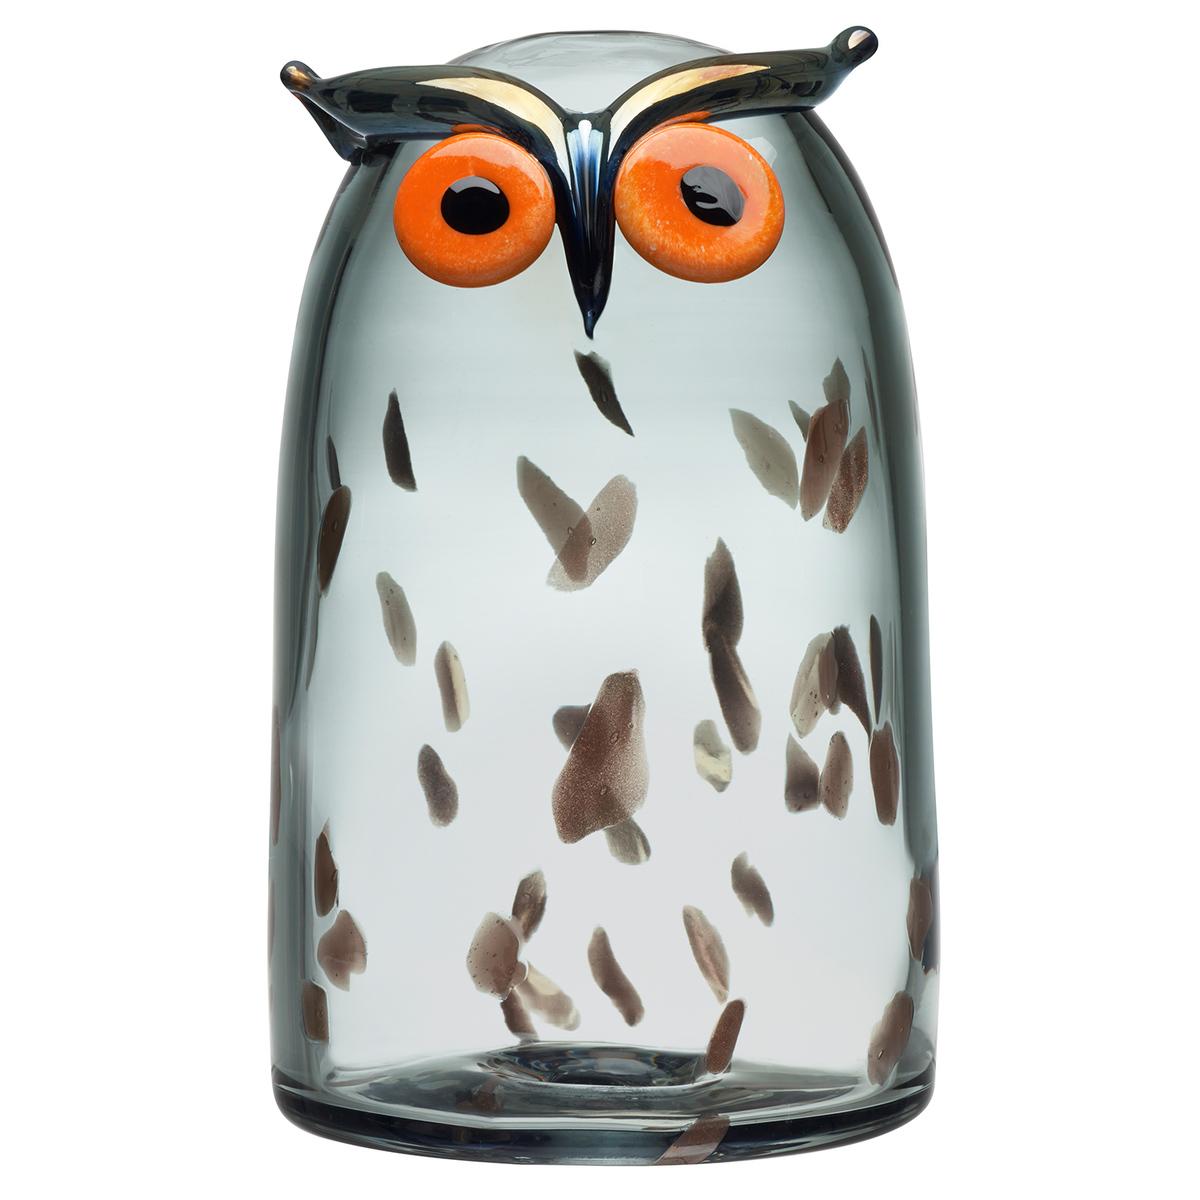 Iittala Birds By Toikka Long Eared Owl Finnish Design Shop